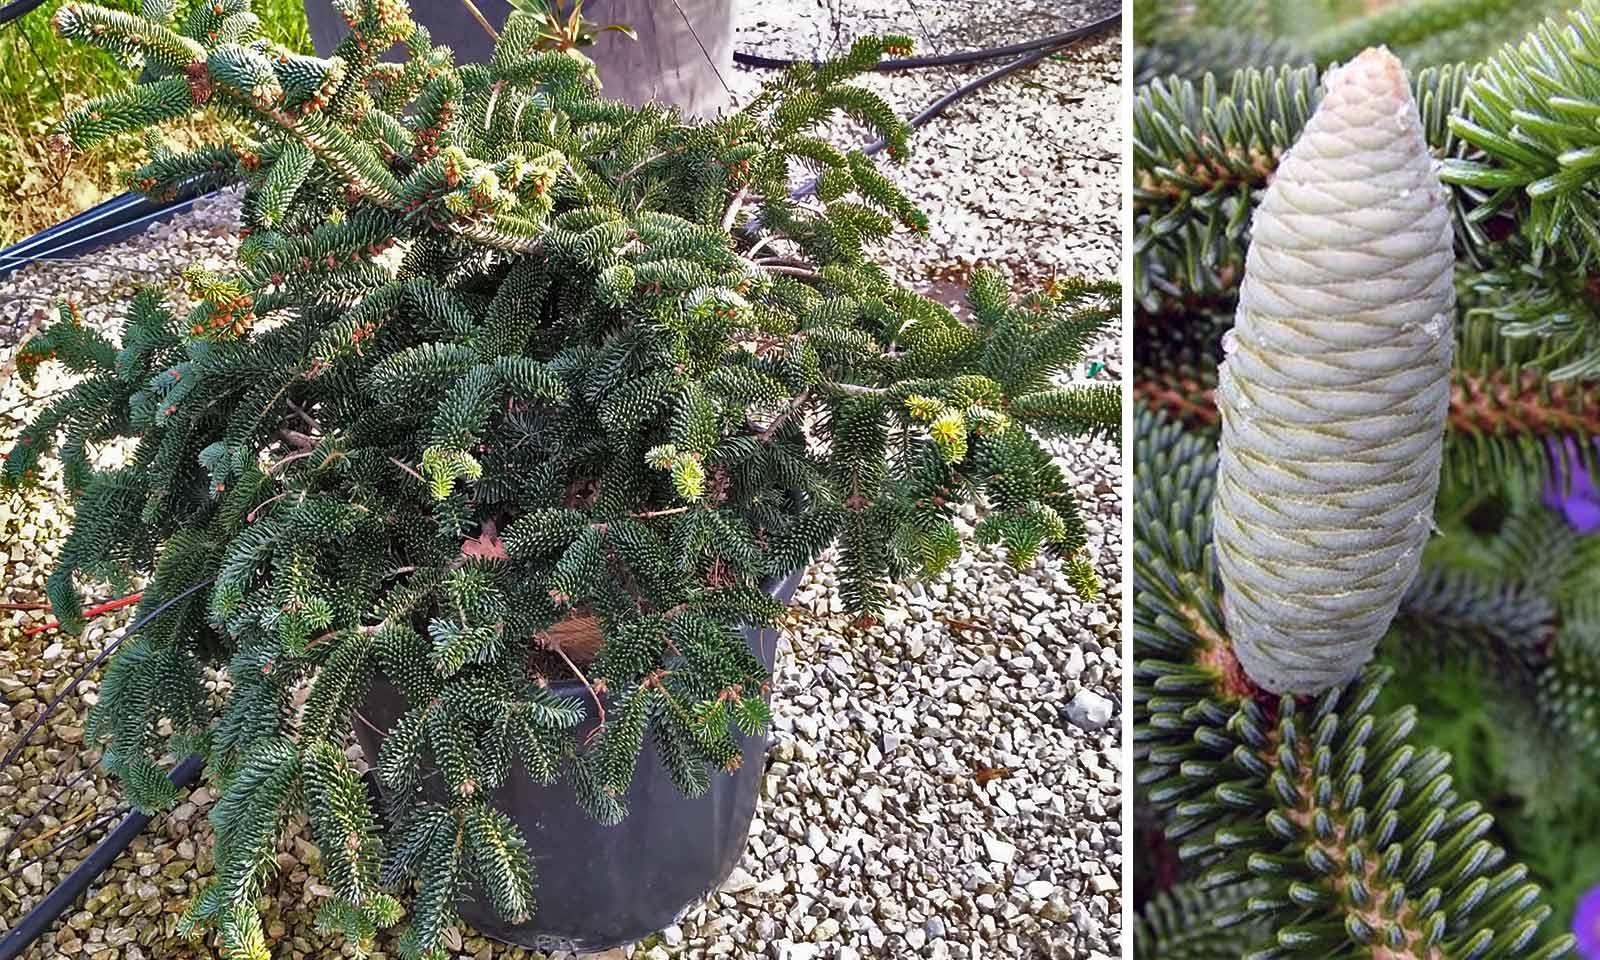 Picea Abies 'Numidica Pendula' (Norway Spruce 'Numidica Pendula')